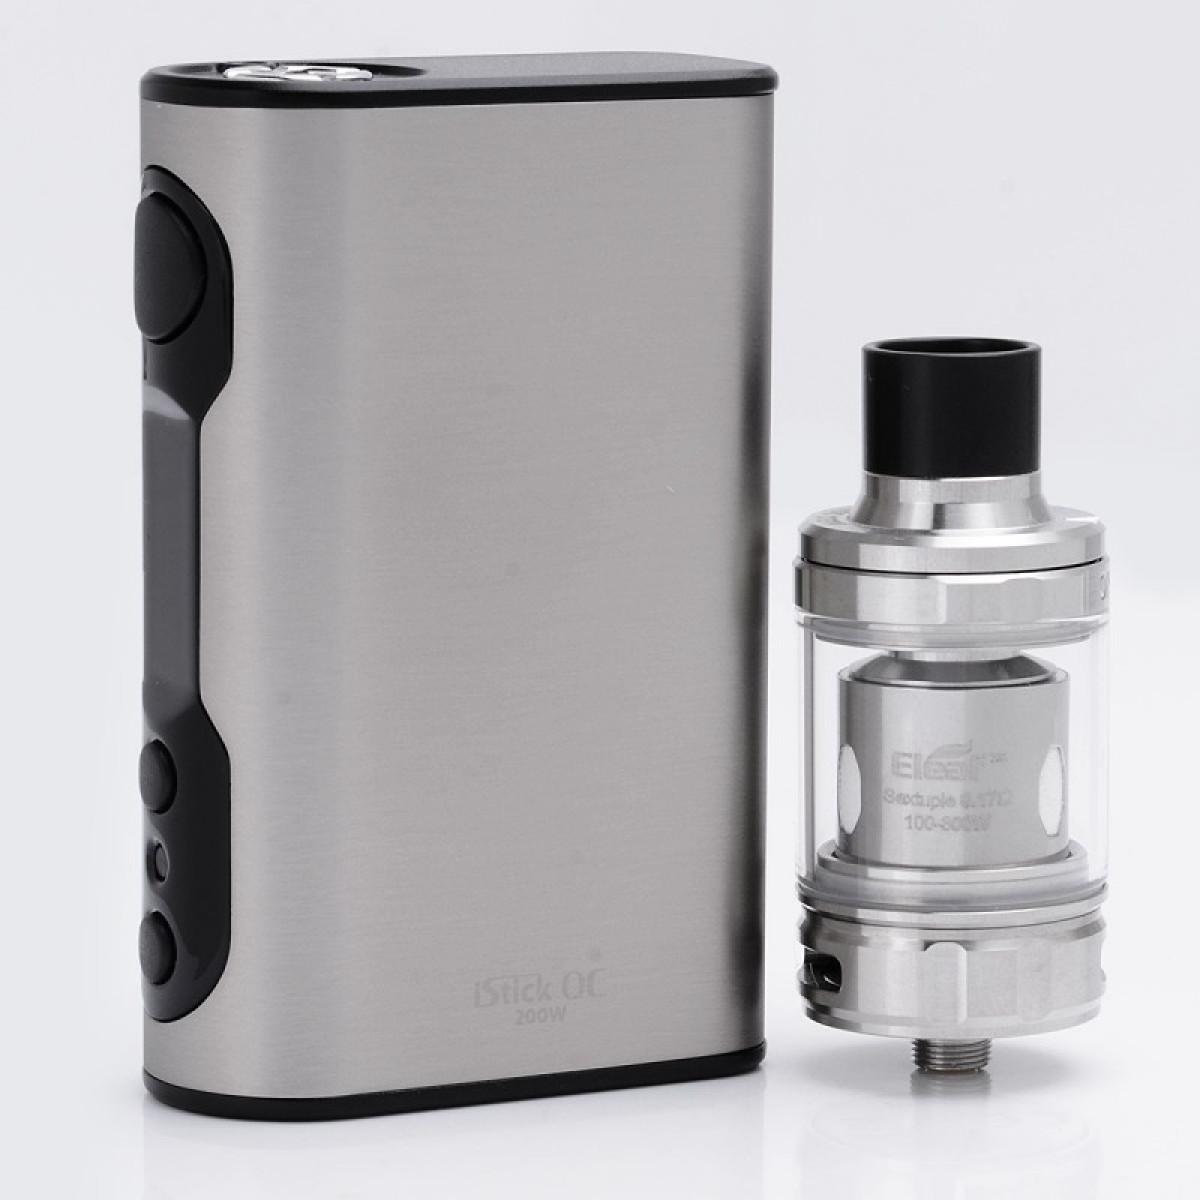 IStick QC 200W